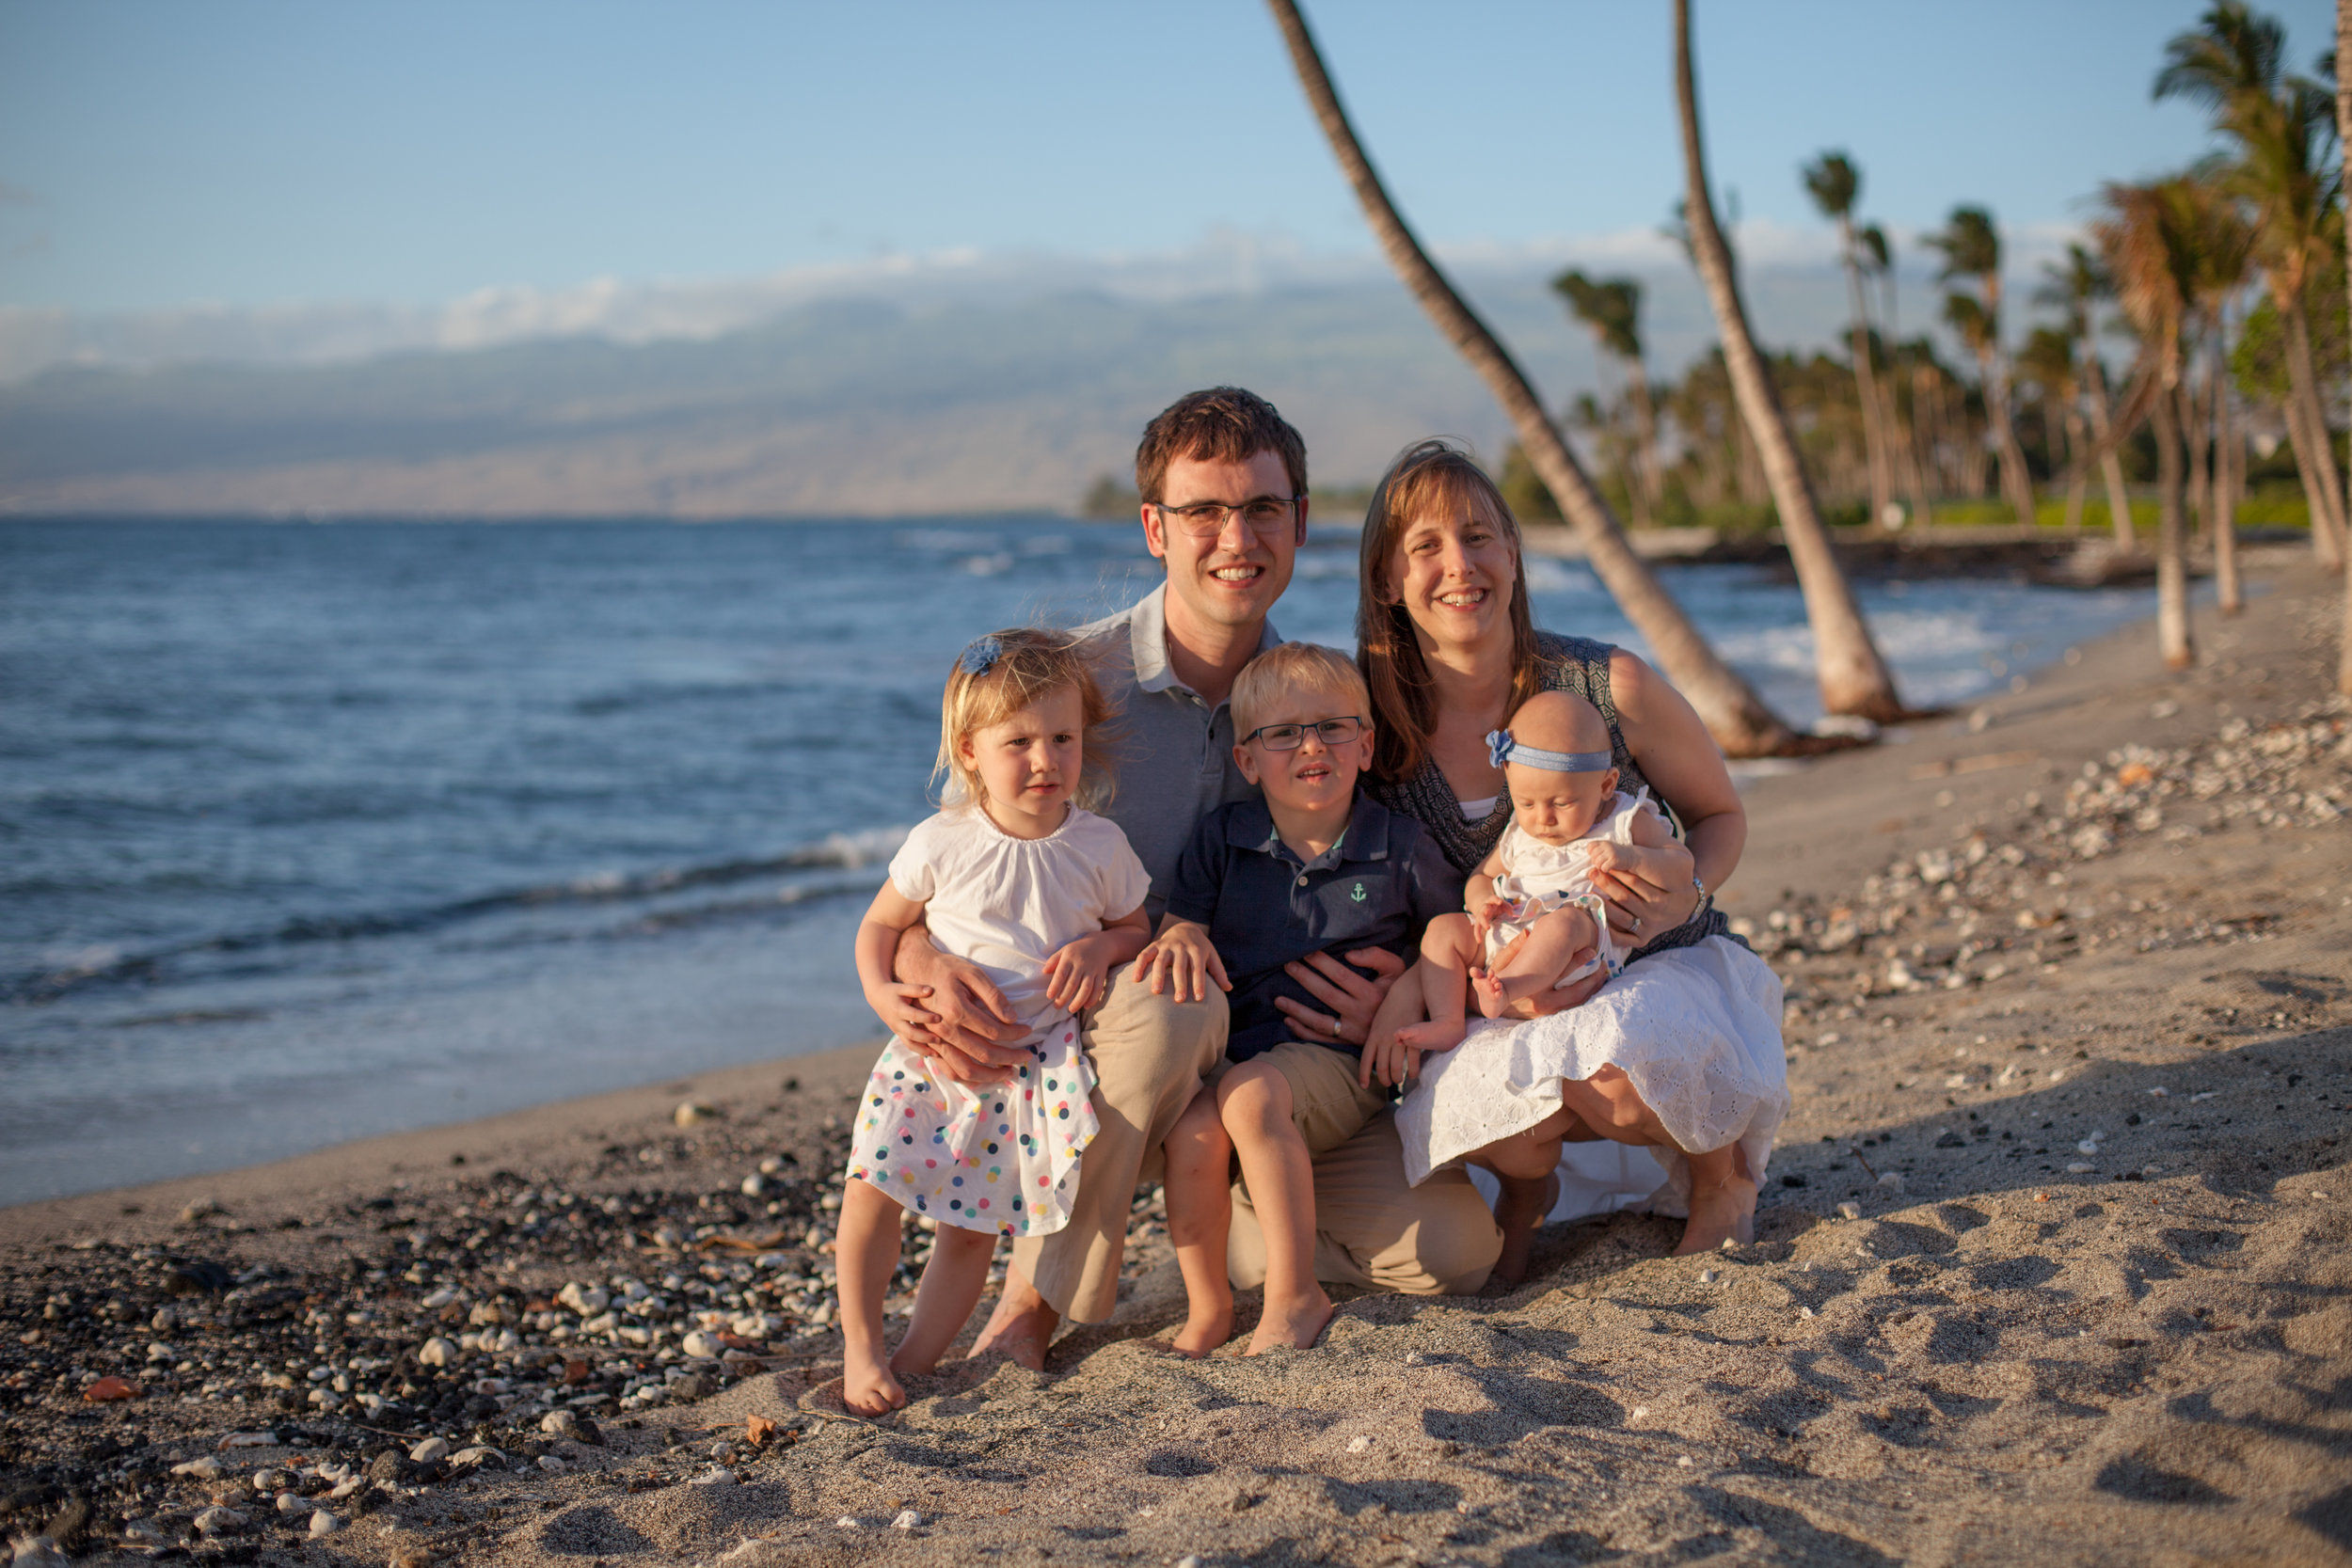 big island hawaii mauna lani beach family © kelilina photography 20170511181347.jpg